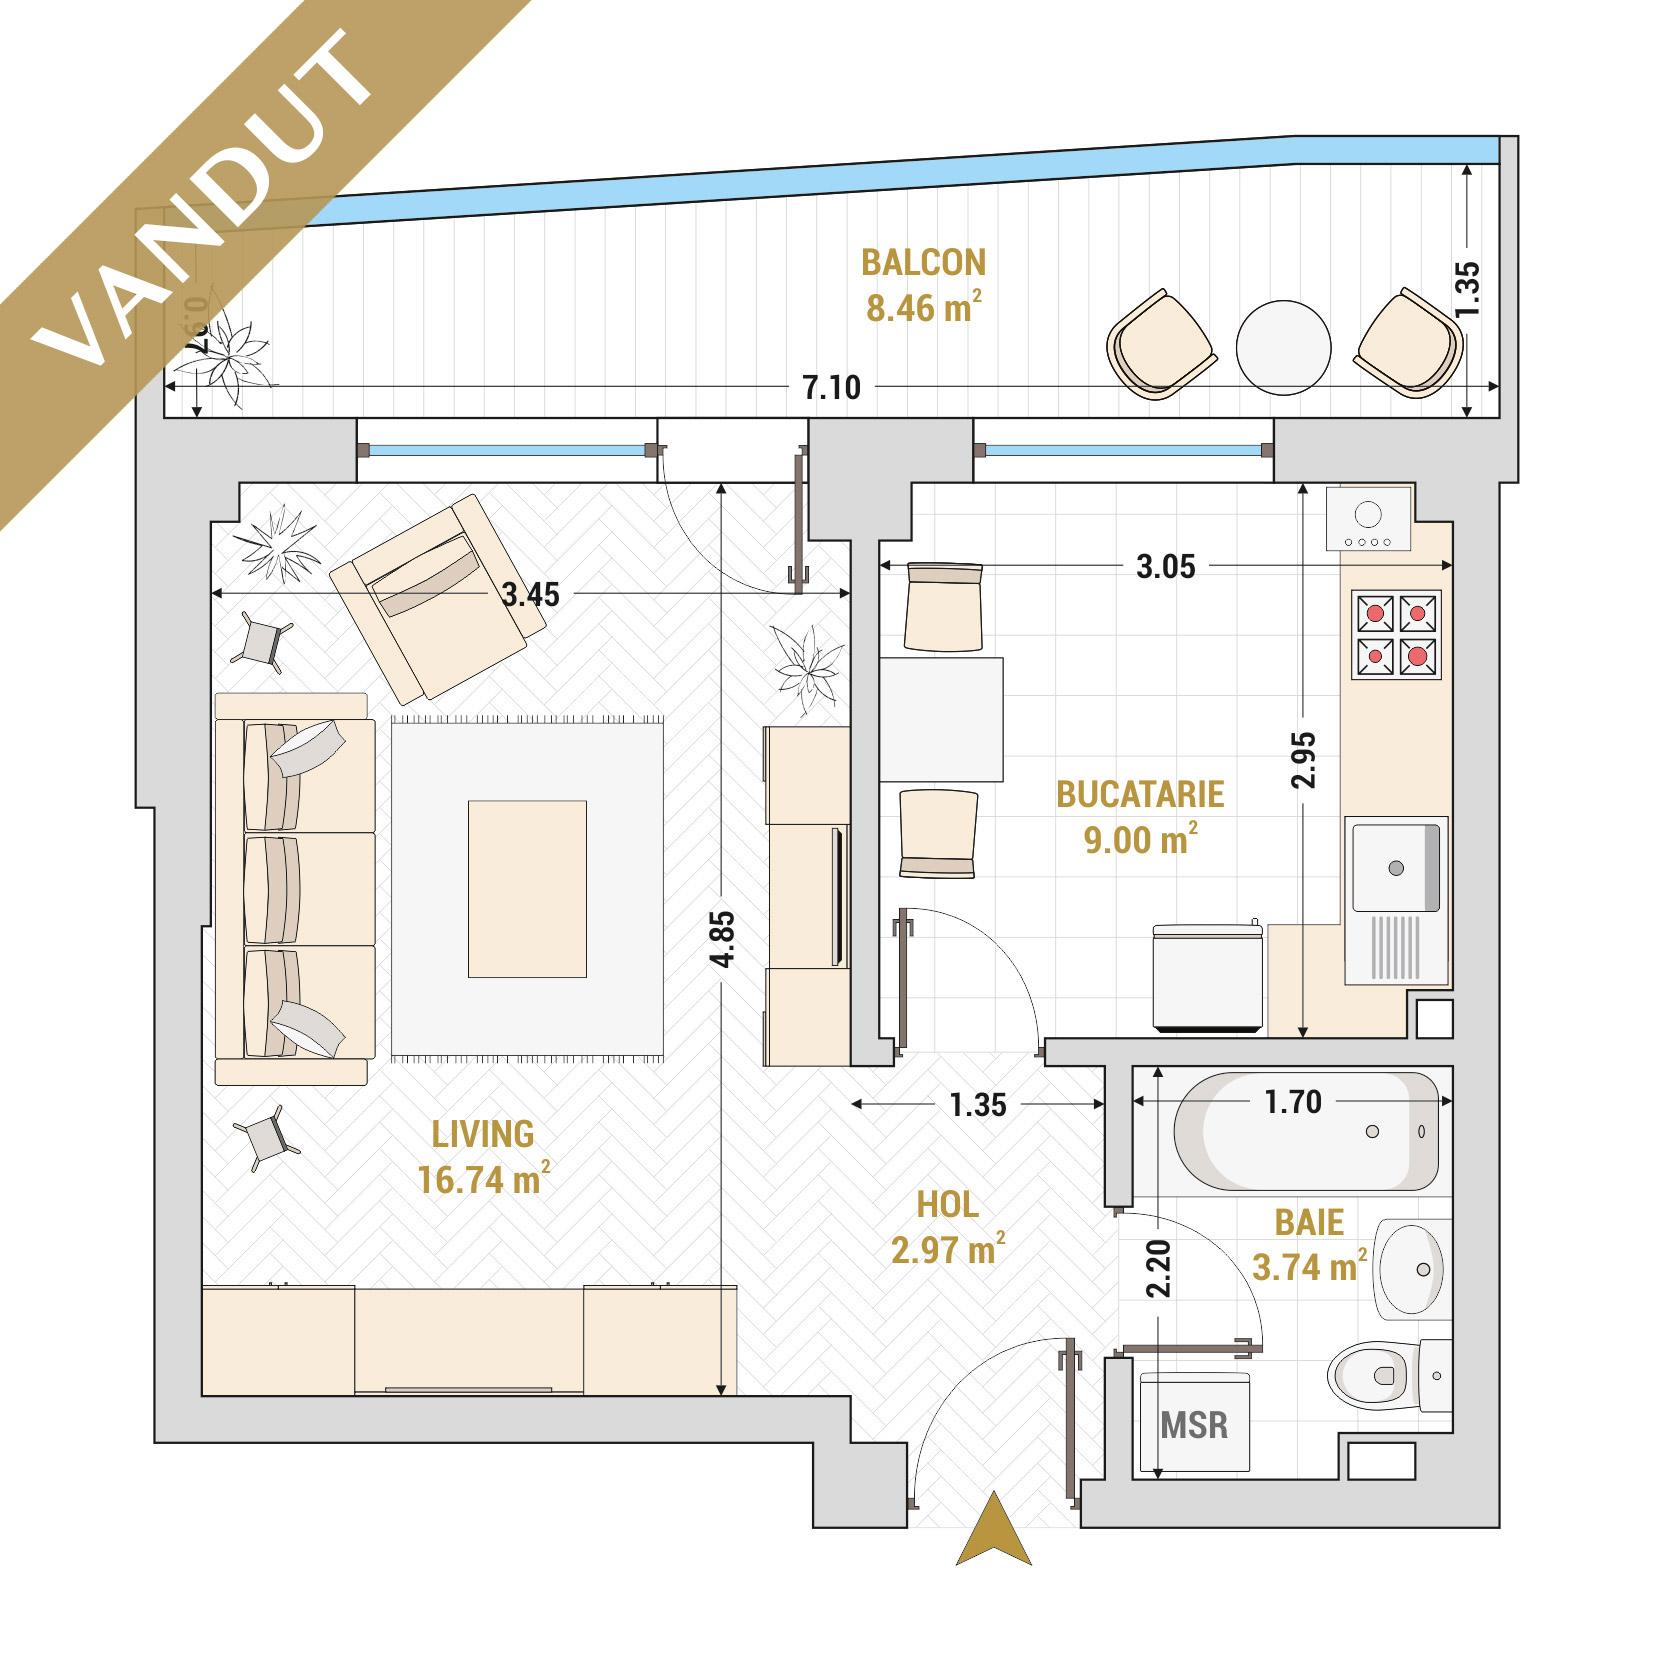 Garsoniere de vanzare Bucuresti - Catedral Residence - Marriott, Piata Unirii, 13 Septembrie, Izvor - Tip 2 - T1 - V